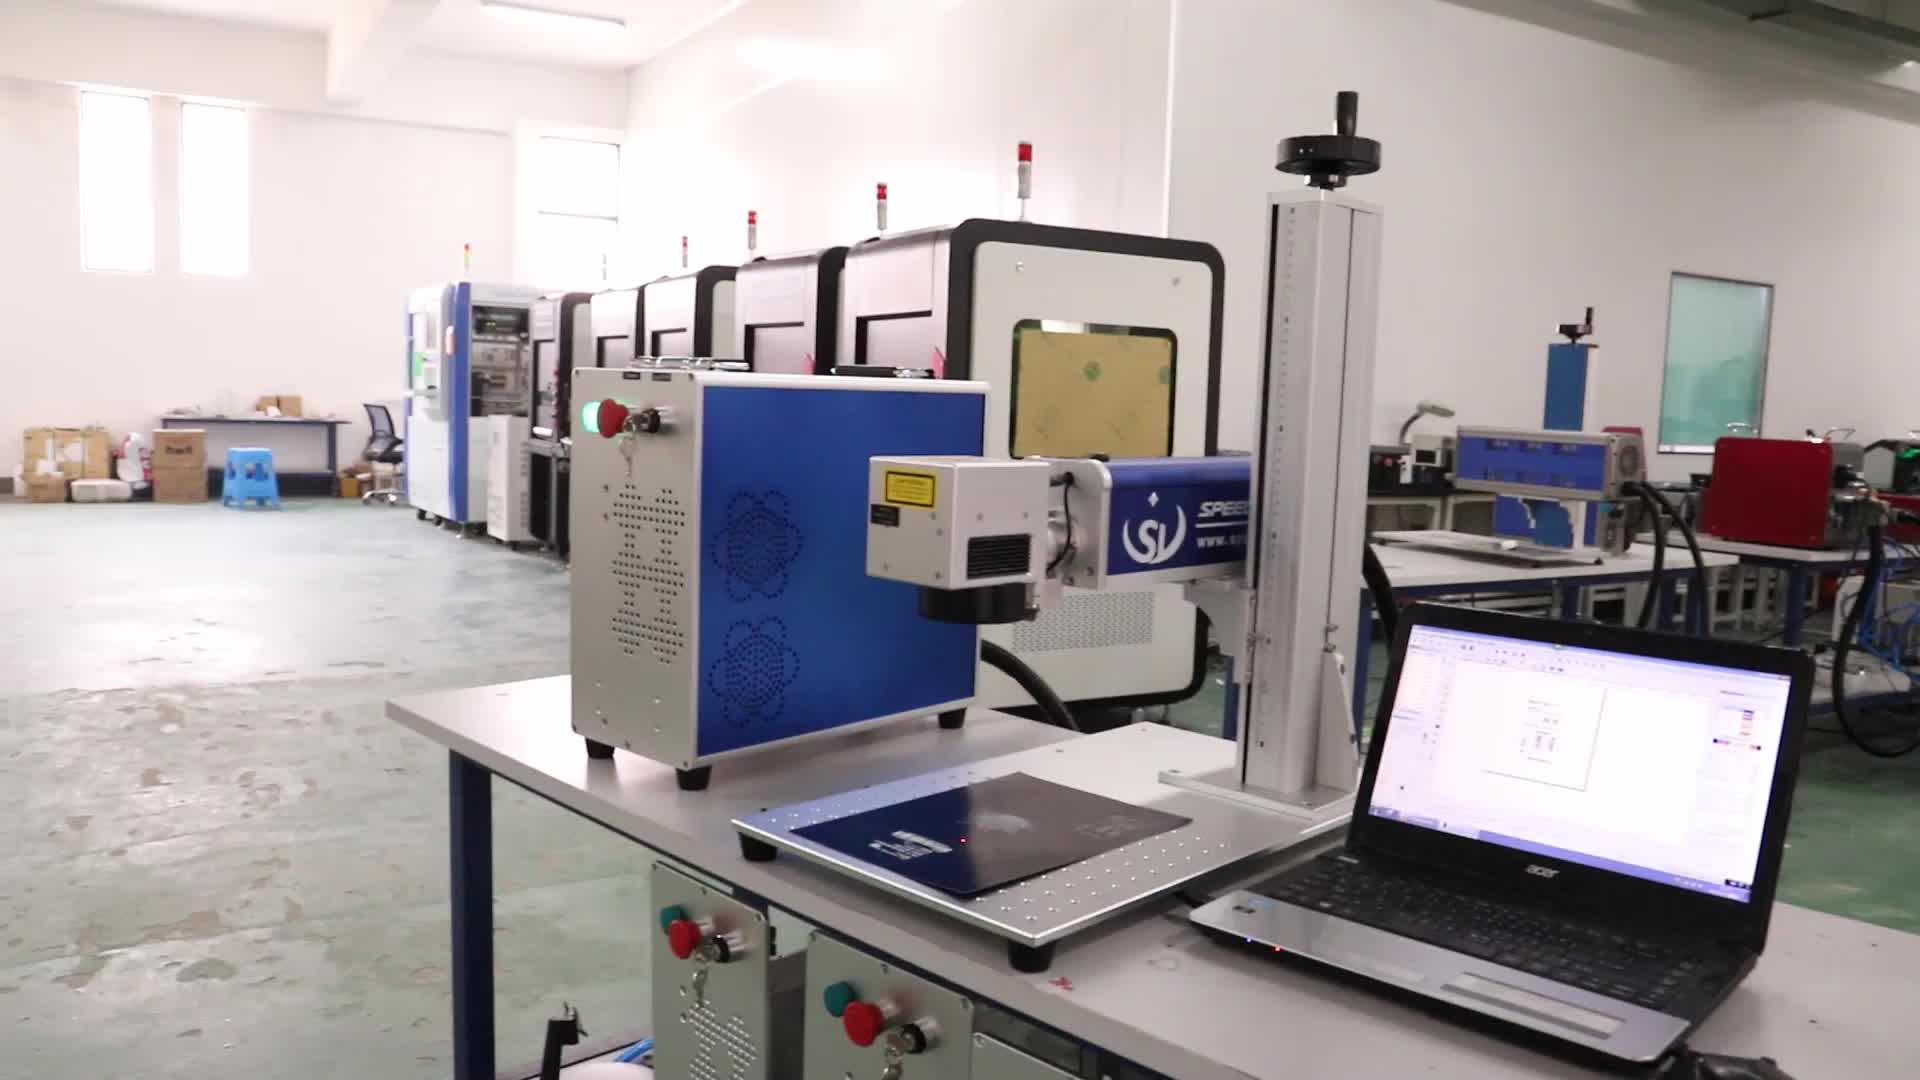 USA Germania Polonia Italia Raycus IPG JPT 20W 30W 50W 60W macchina per incisione laser a fibra